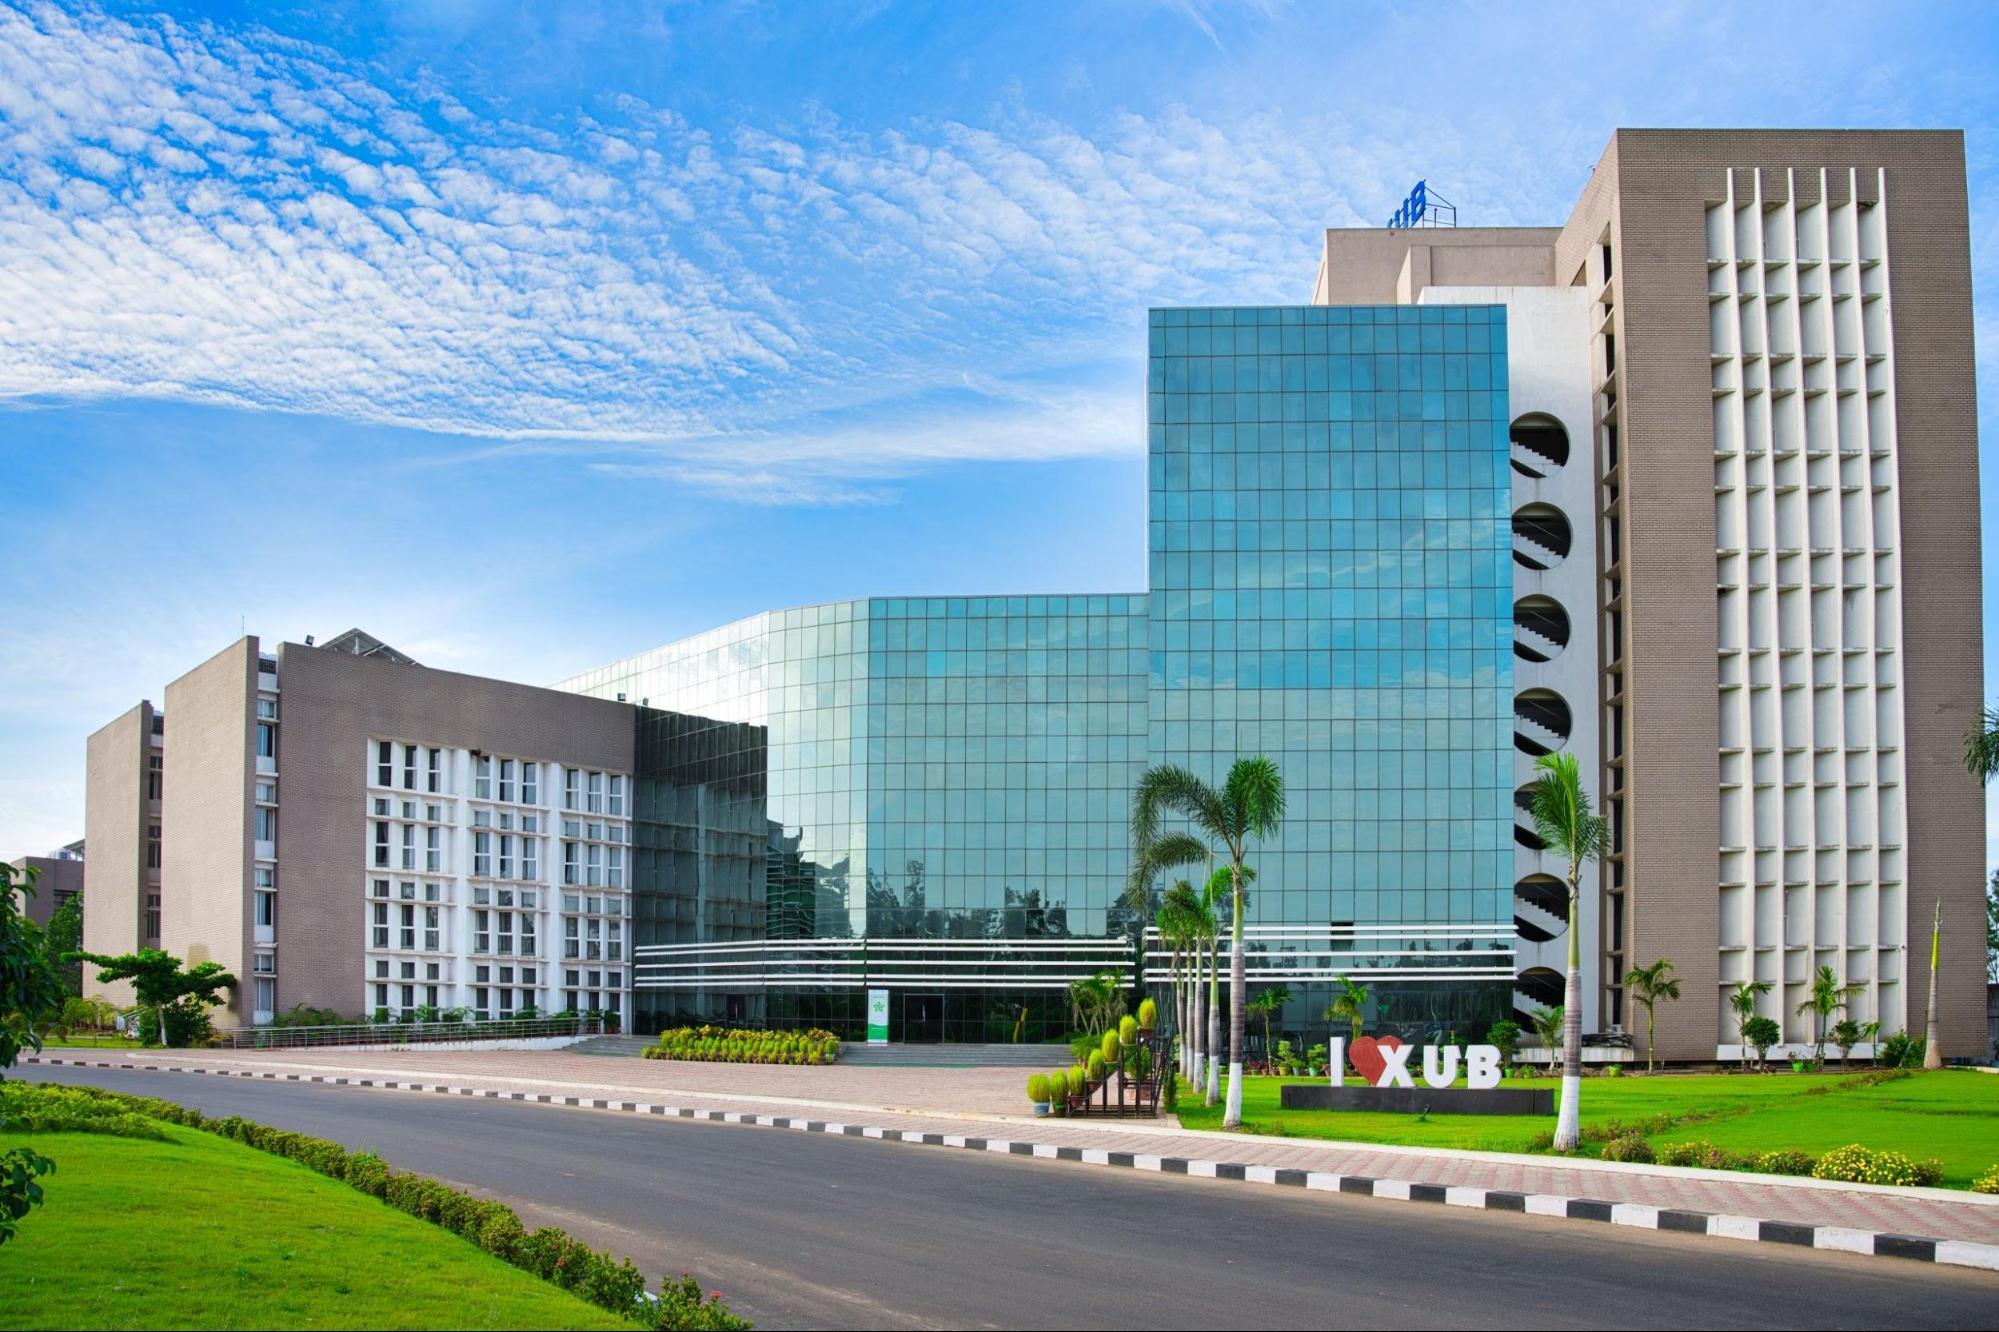 Xavier University Bhubaneswar – Inspiring Blazing Minds and Souls